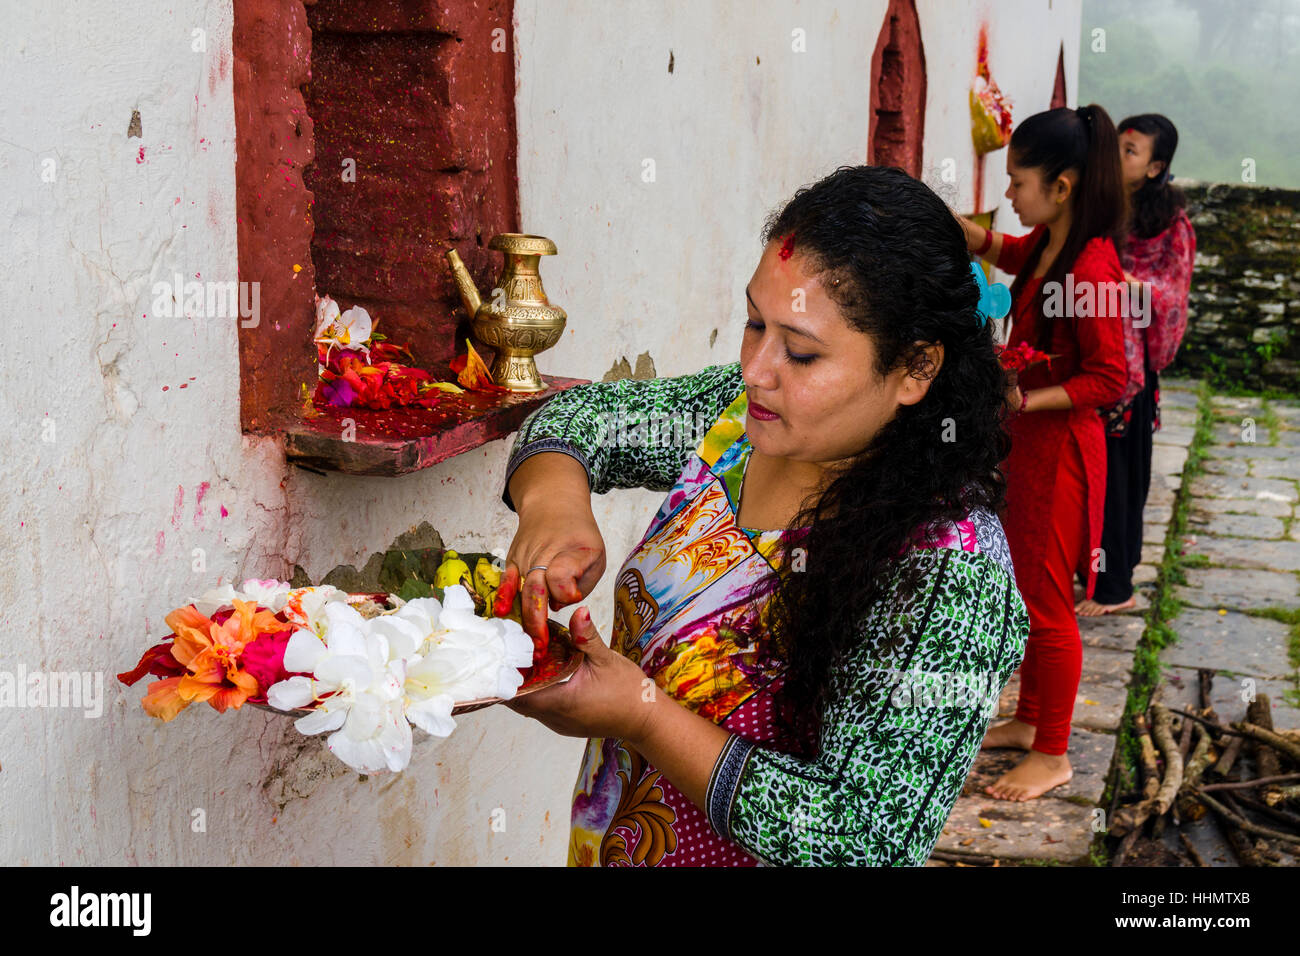 Woman is offering prasad to the statues of gods at hinduist festival Darsain, temple Khadga Devi Mandir - Stock Image